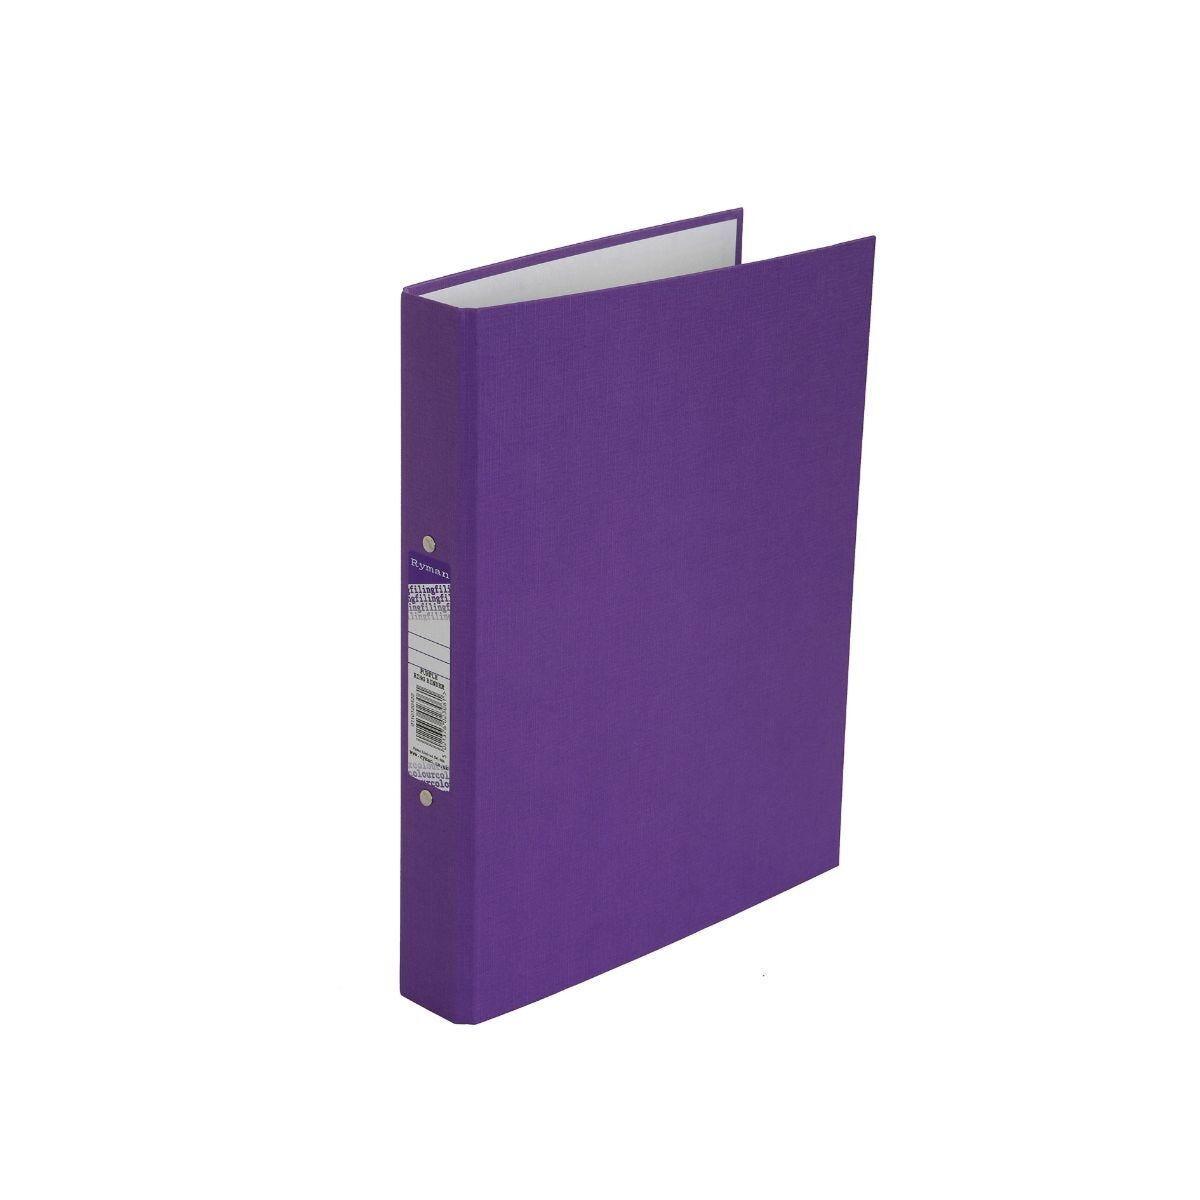 Ryman Colour Ring Binder A4 Purple